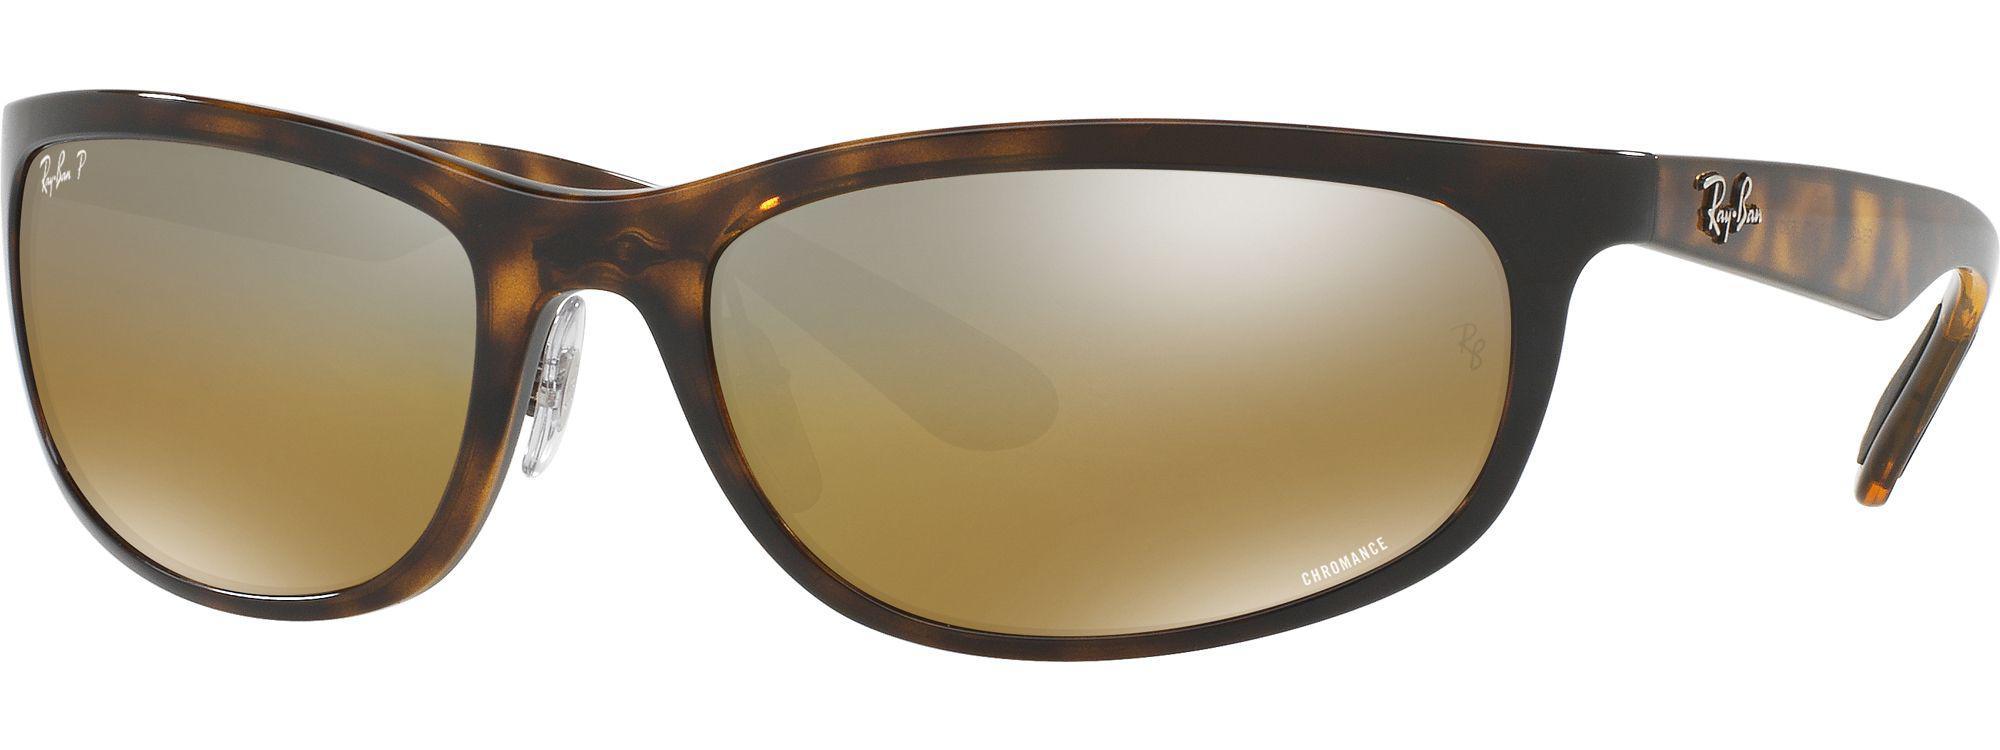 9aafc6dca9 Lyst - Ray-Ban Rb4265 Chromance Polarized Sunglasses for Men